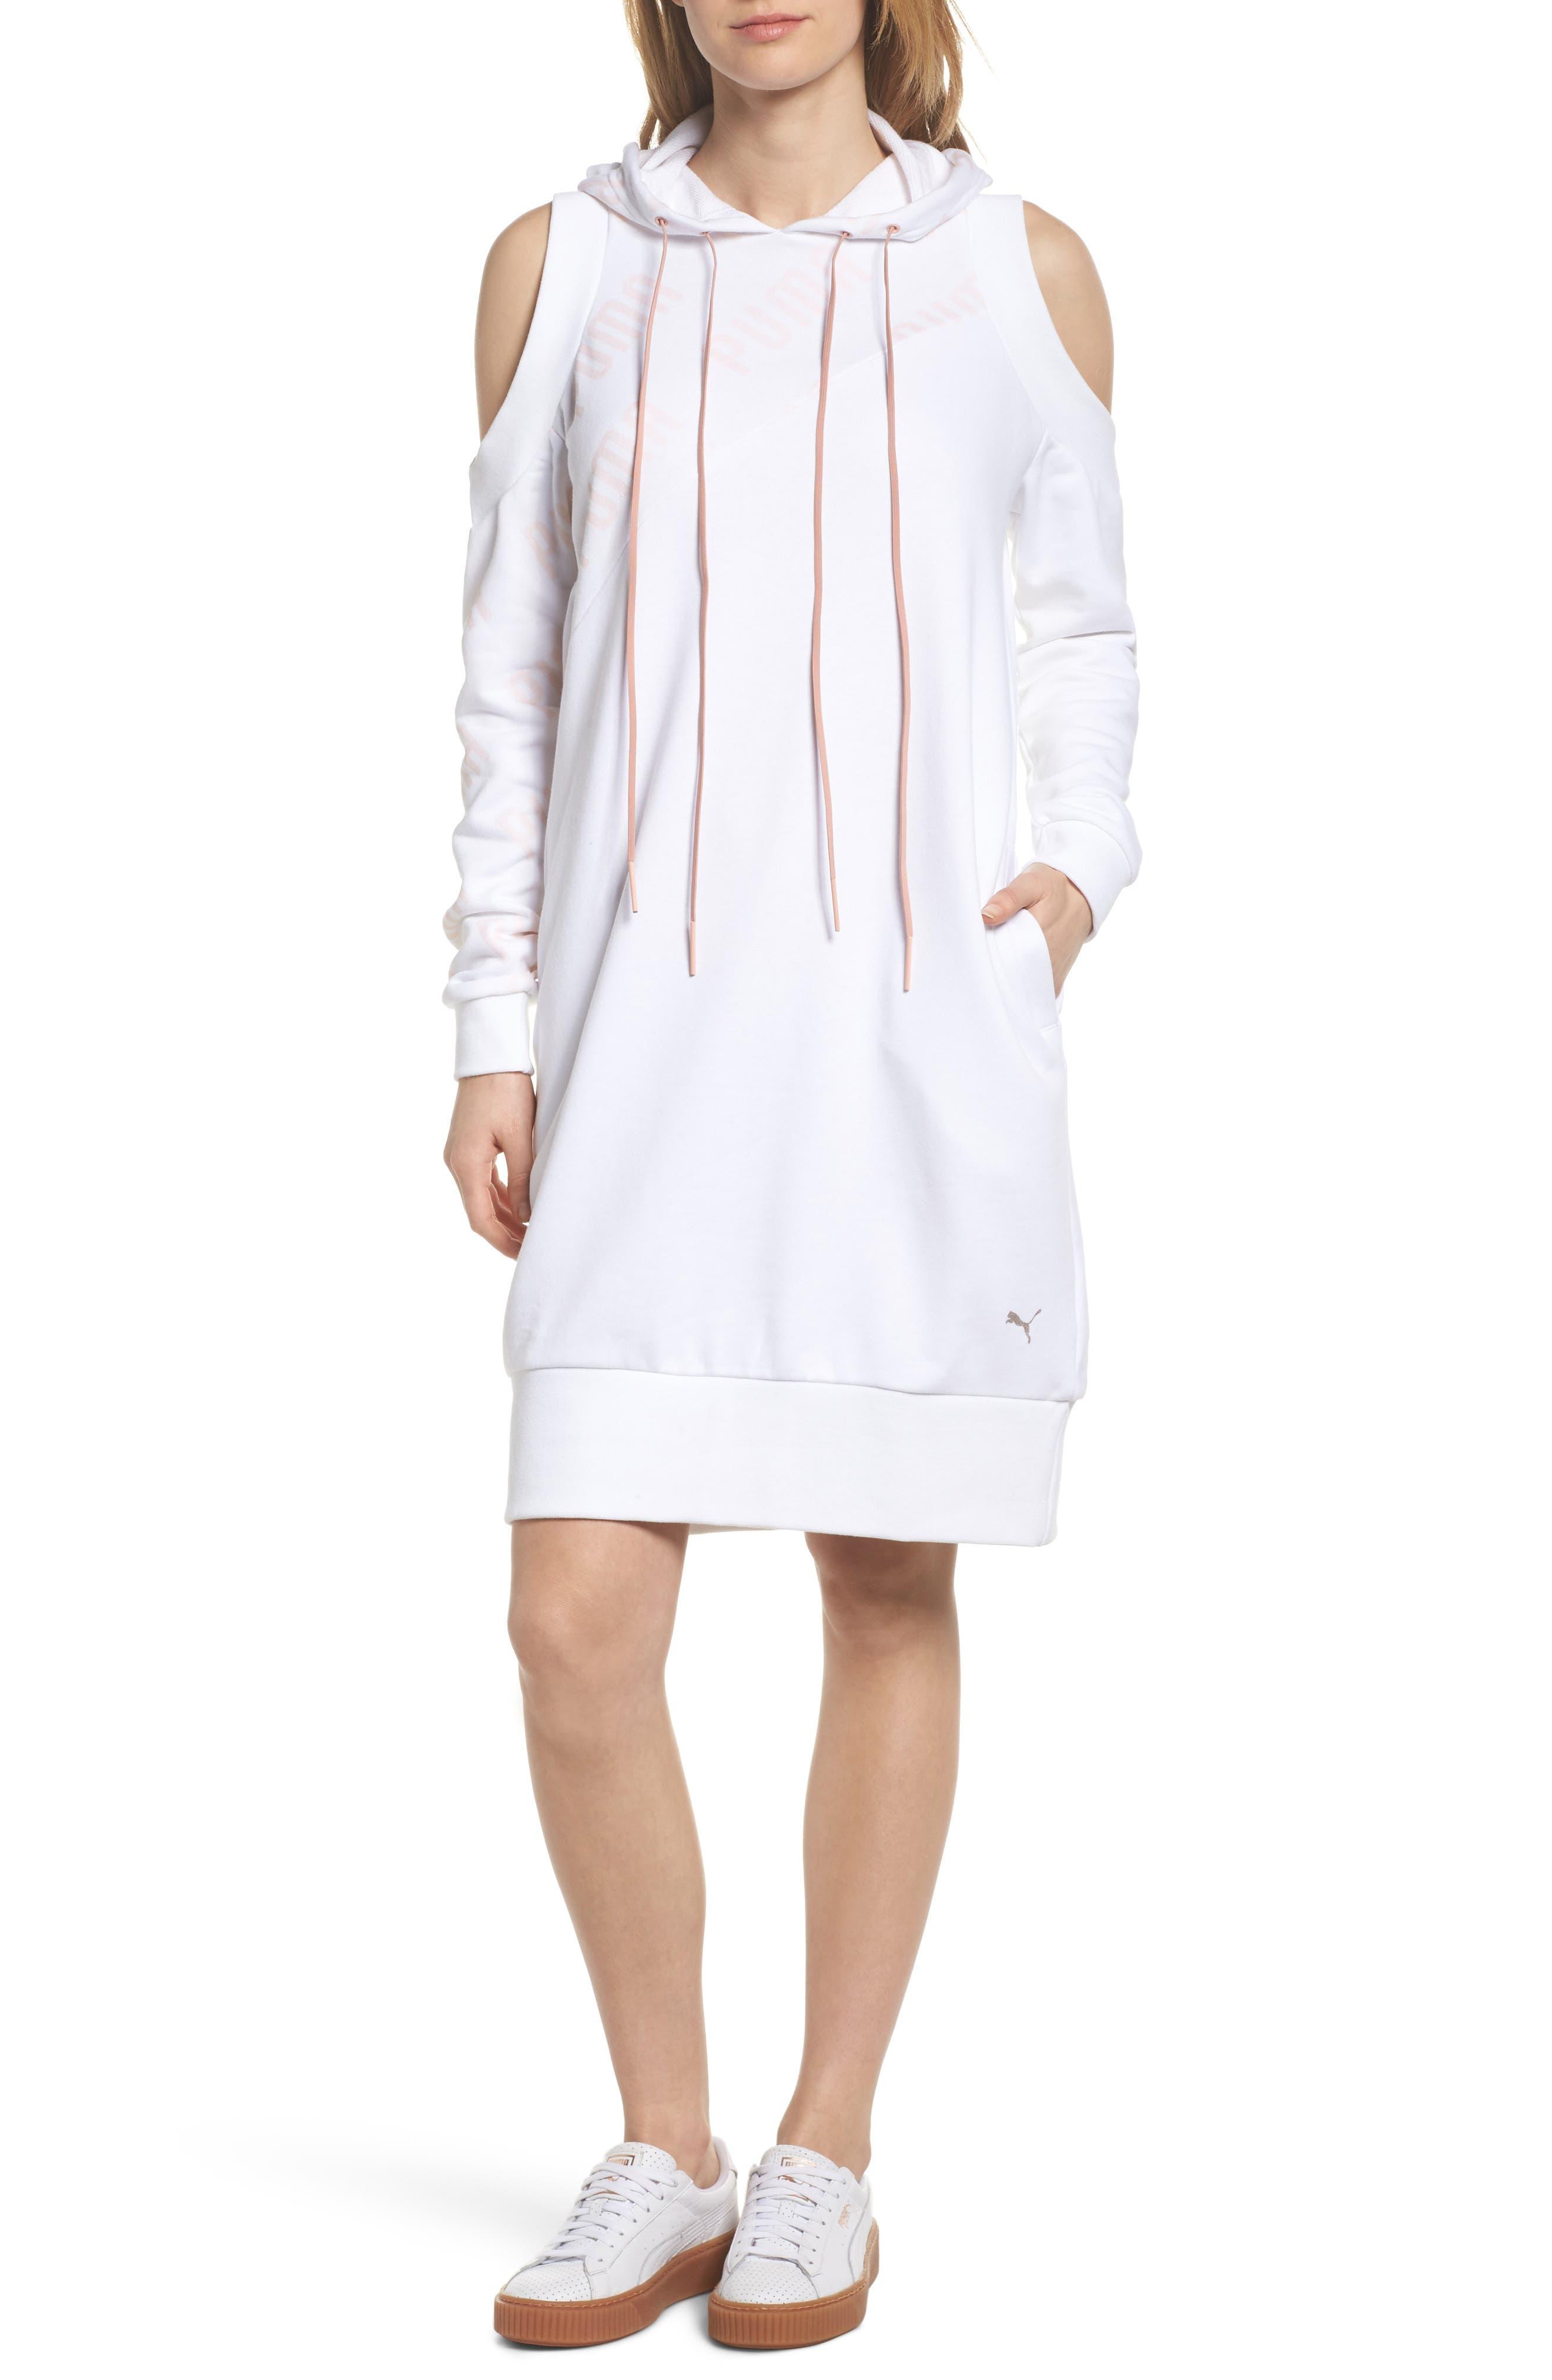 Puma En Pointe Drawstring Dress